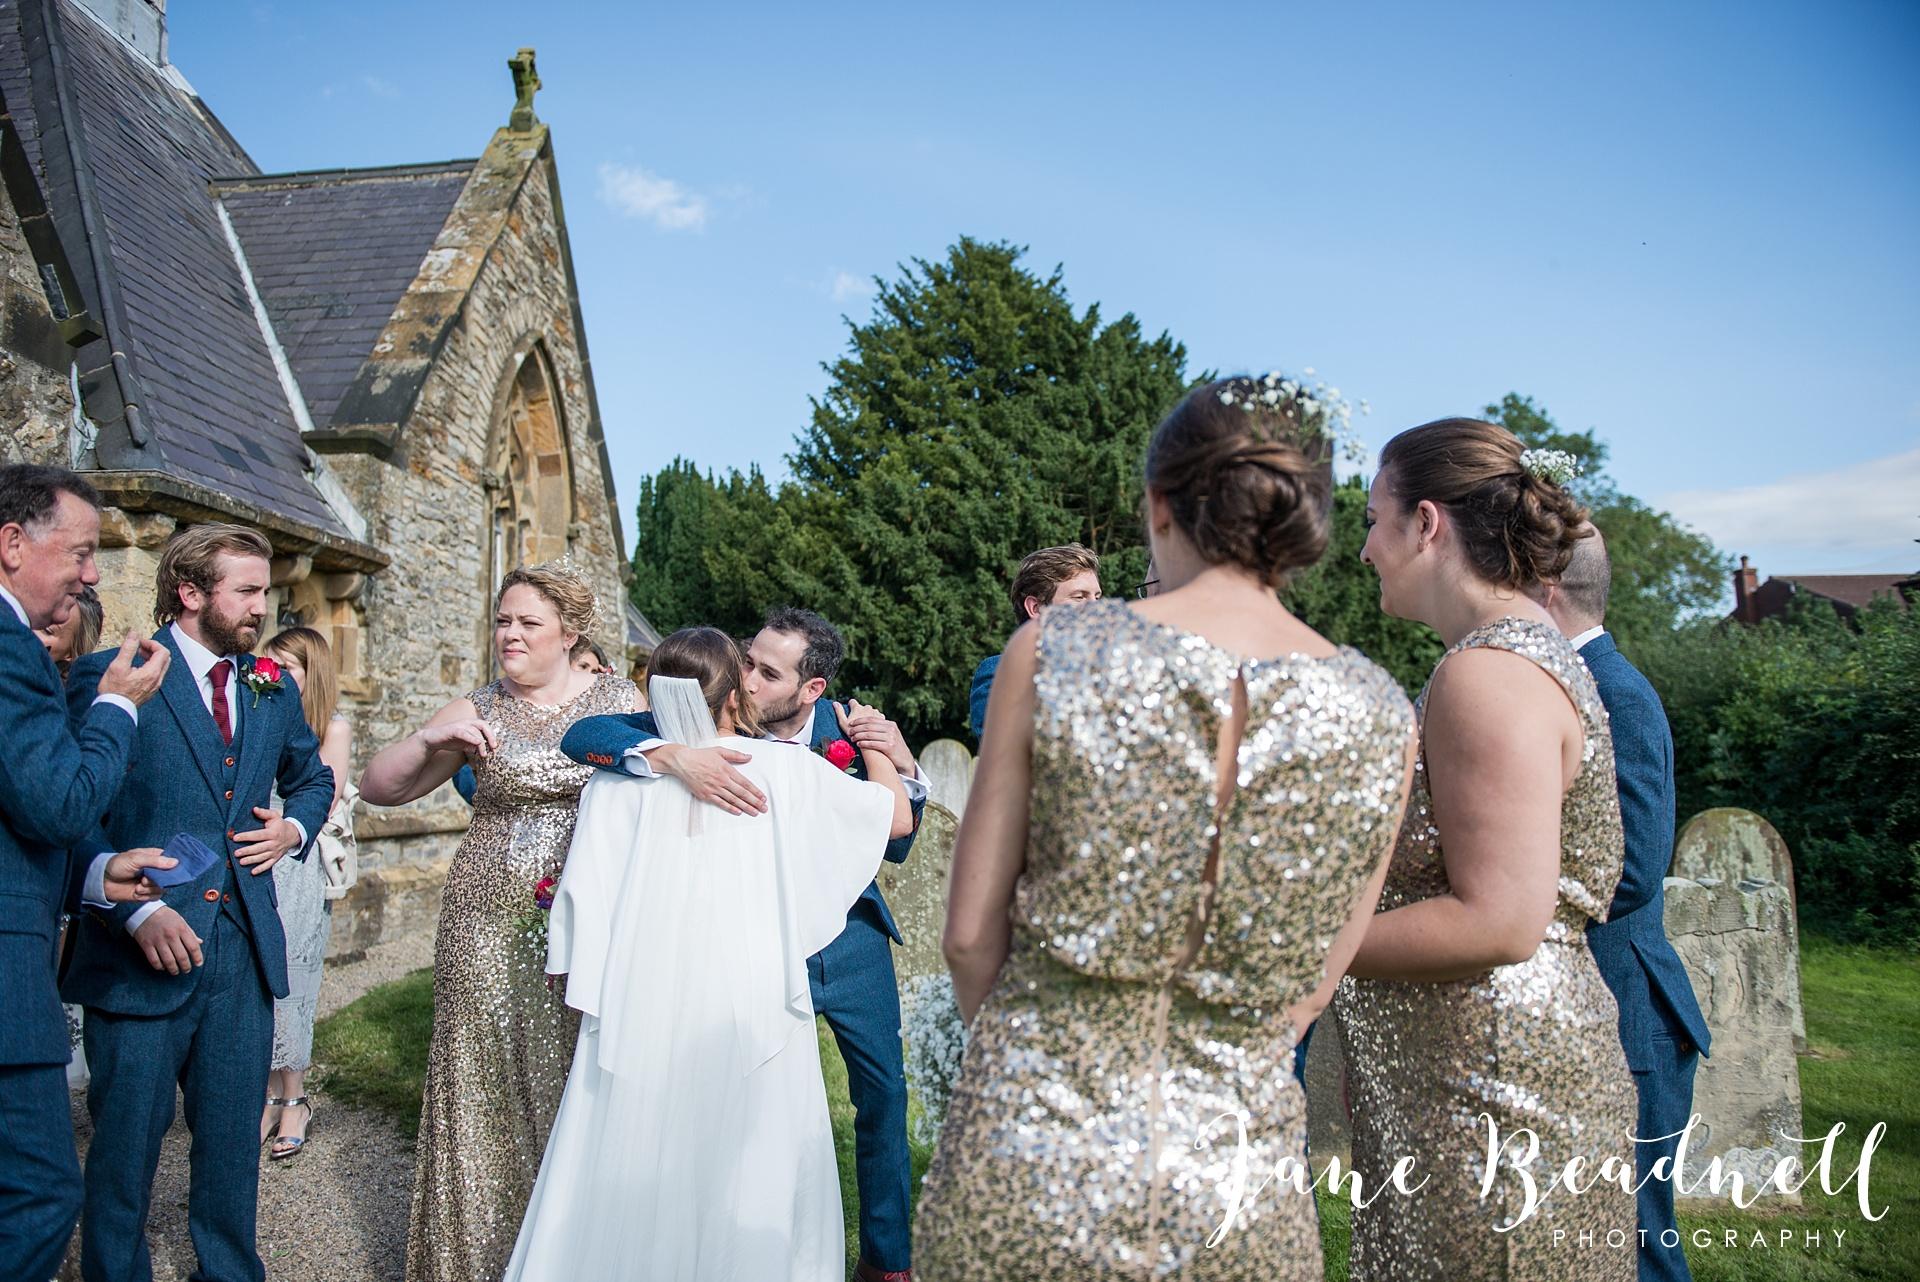 fine-art-wedding-photographer-jane-beadnell-yorkshire-wedding-photographer_0056